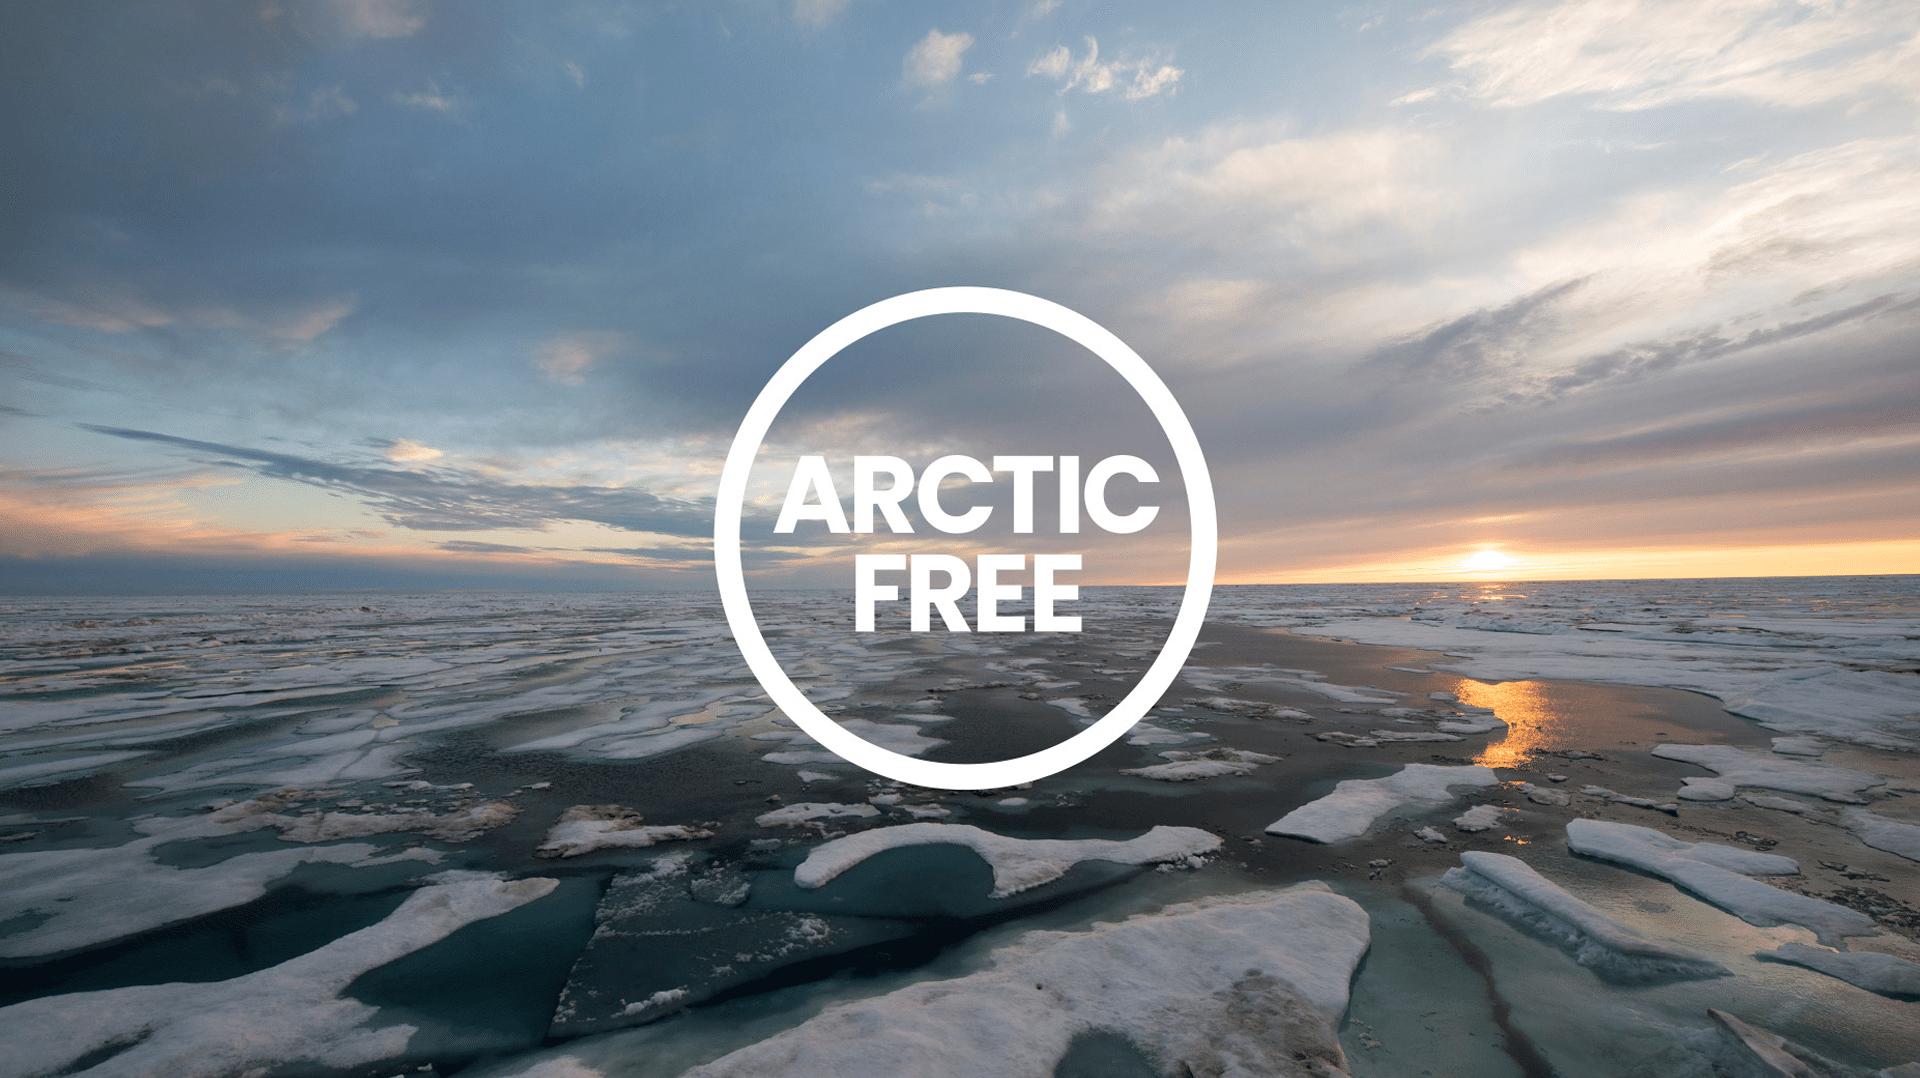 Parvati Foundation, MAPS, Marine Arctic Peace Sanctuary, Fashion and a Healthy Future: Arctic Free